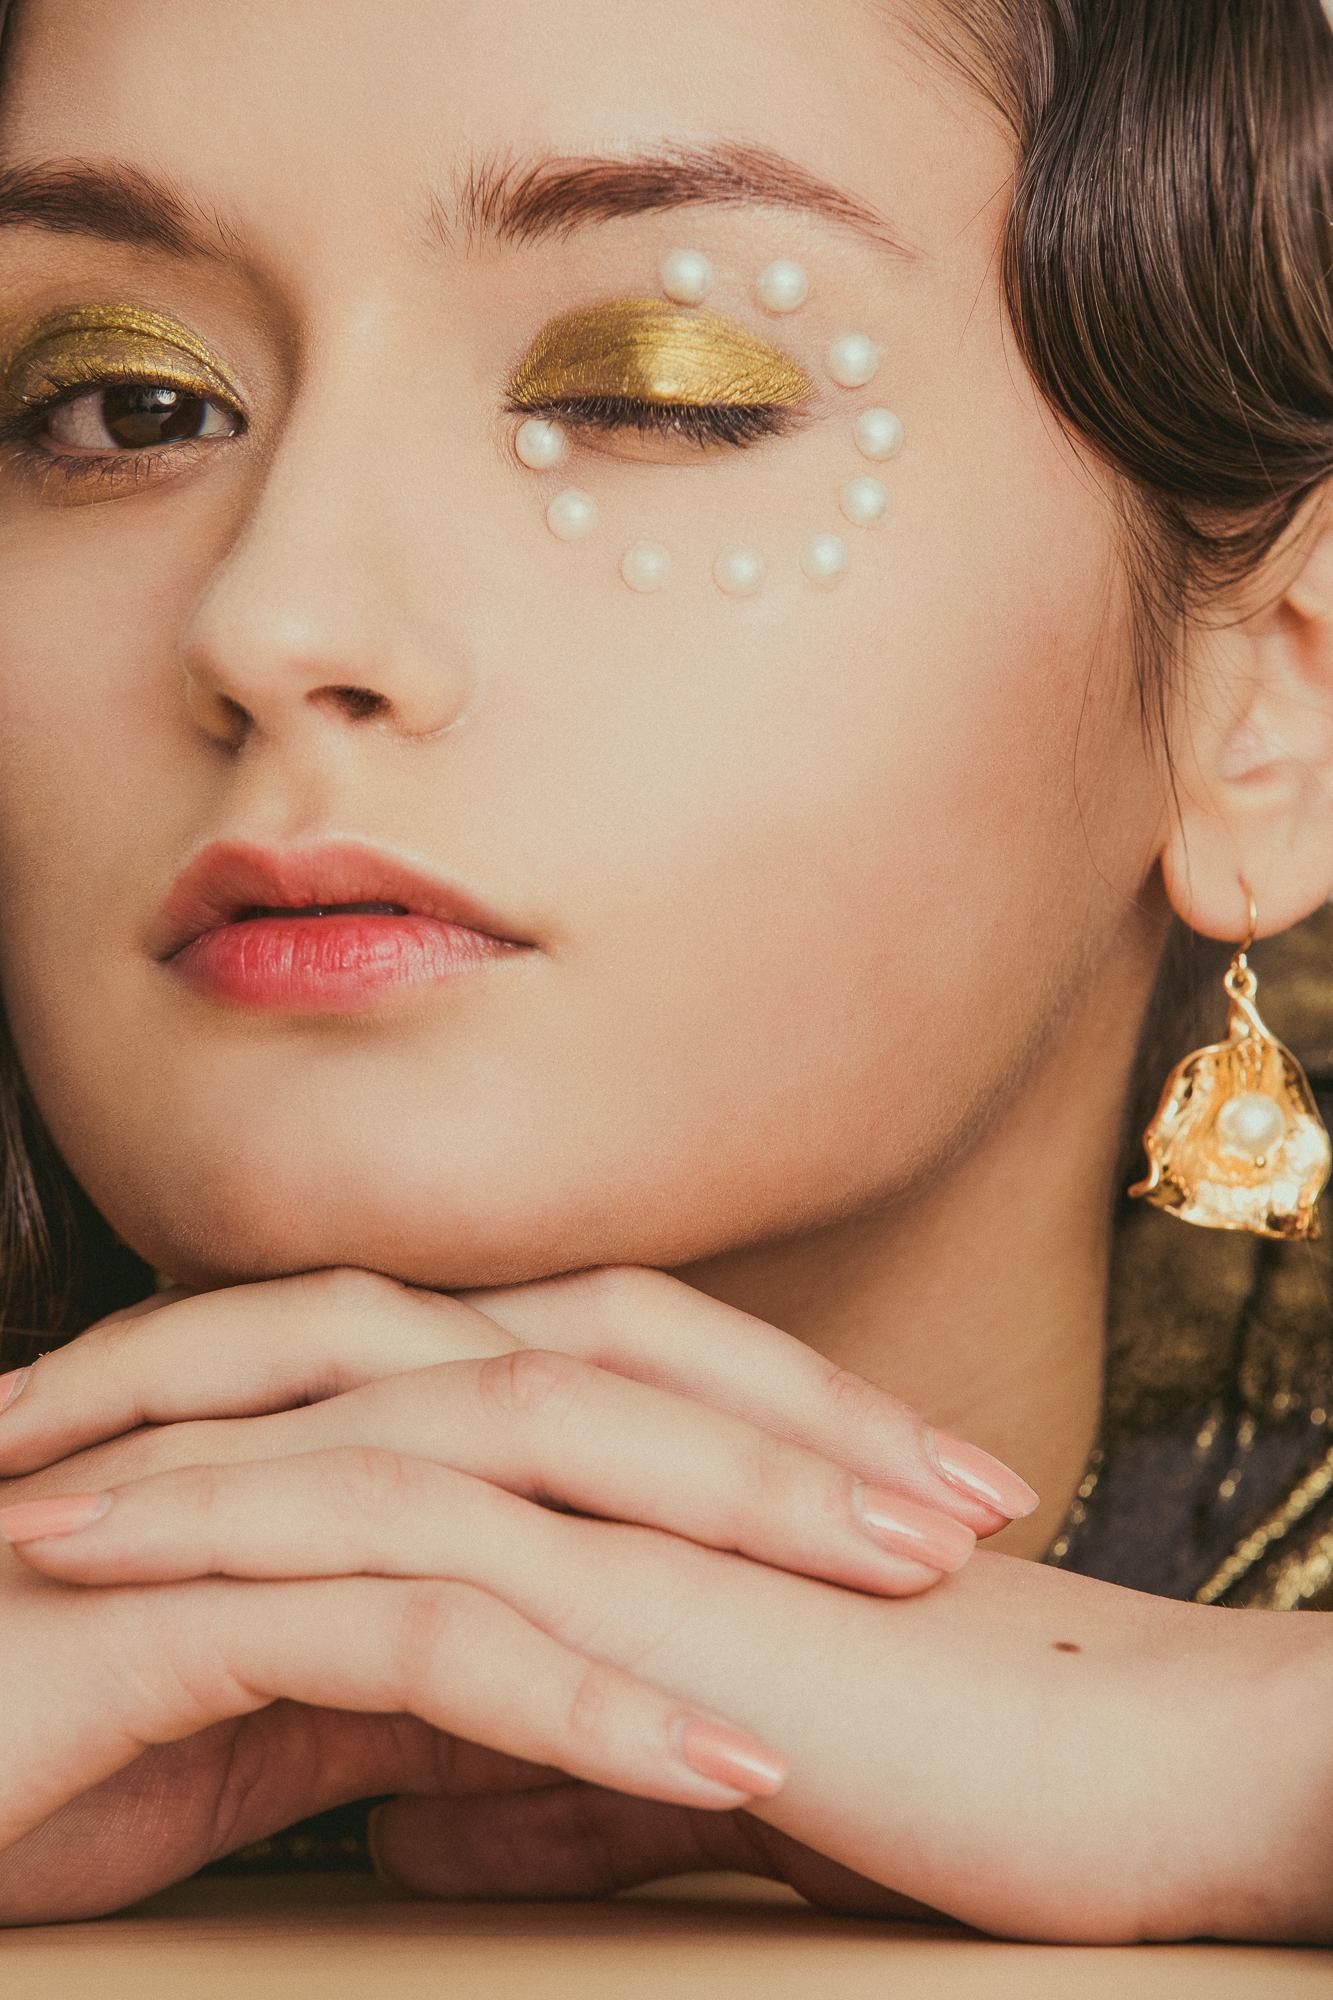 Duo-Linn-Lofficiel-Beauty-Editorial-02.jpg